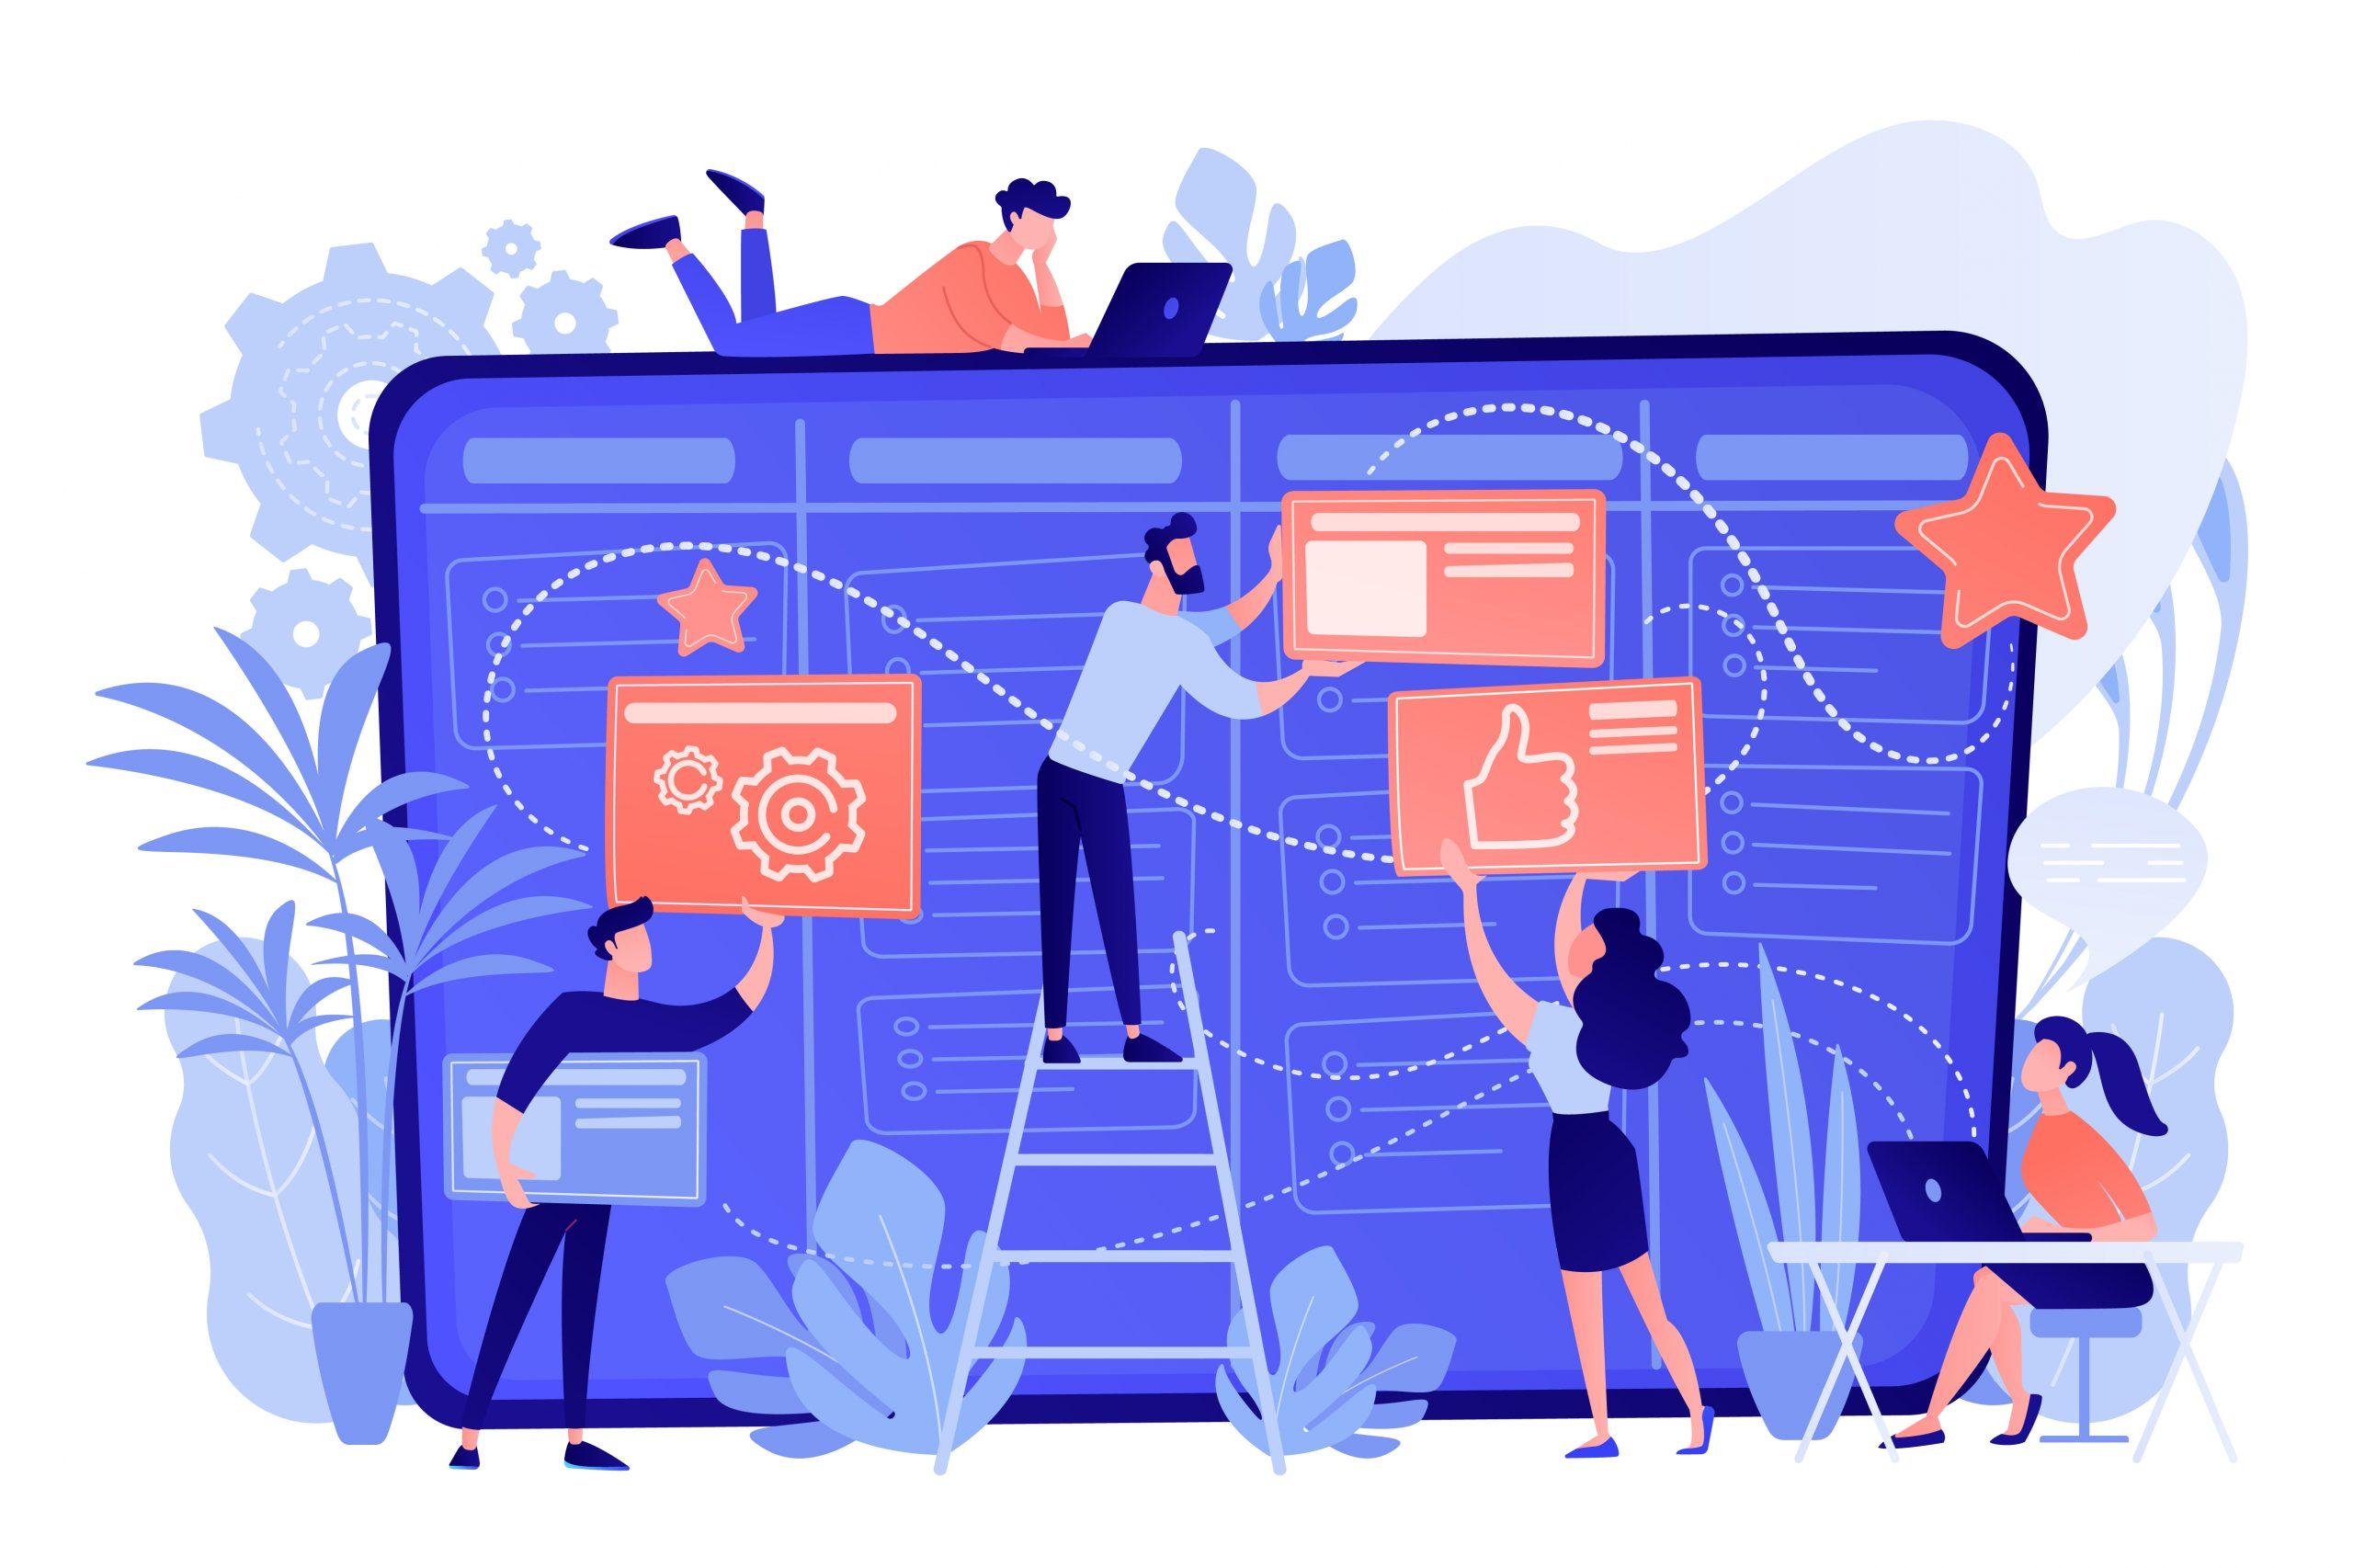 Kanban board concept vector illustration.